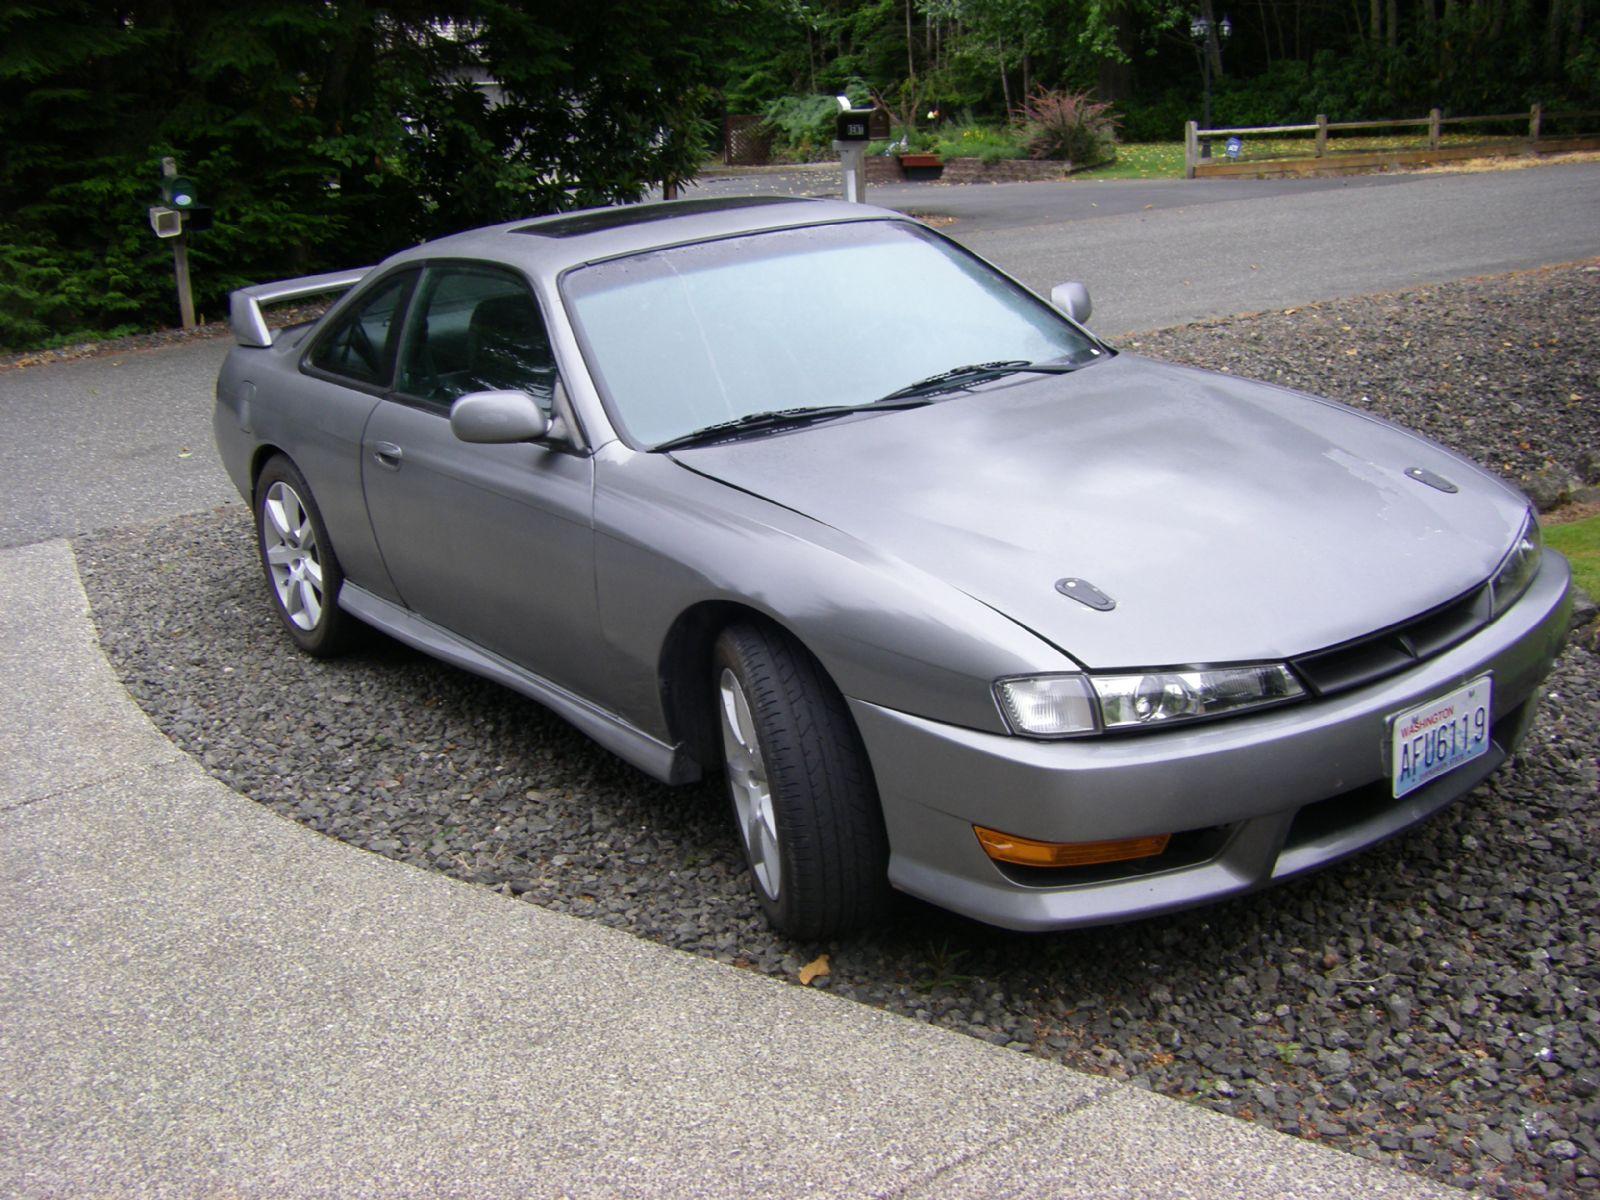 1995 Nissan S14 240sx Se For Sale Bremerton Washington